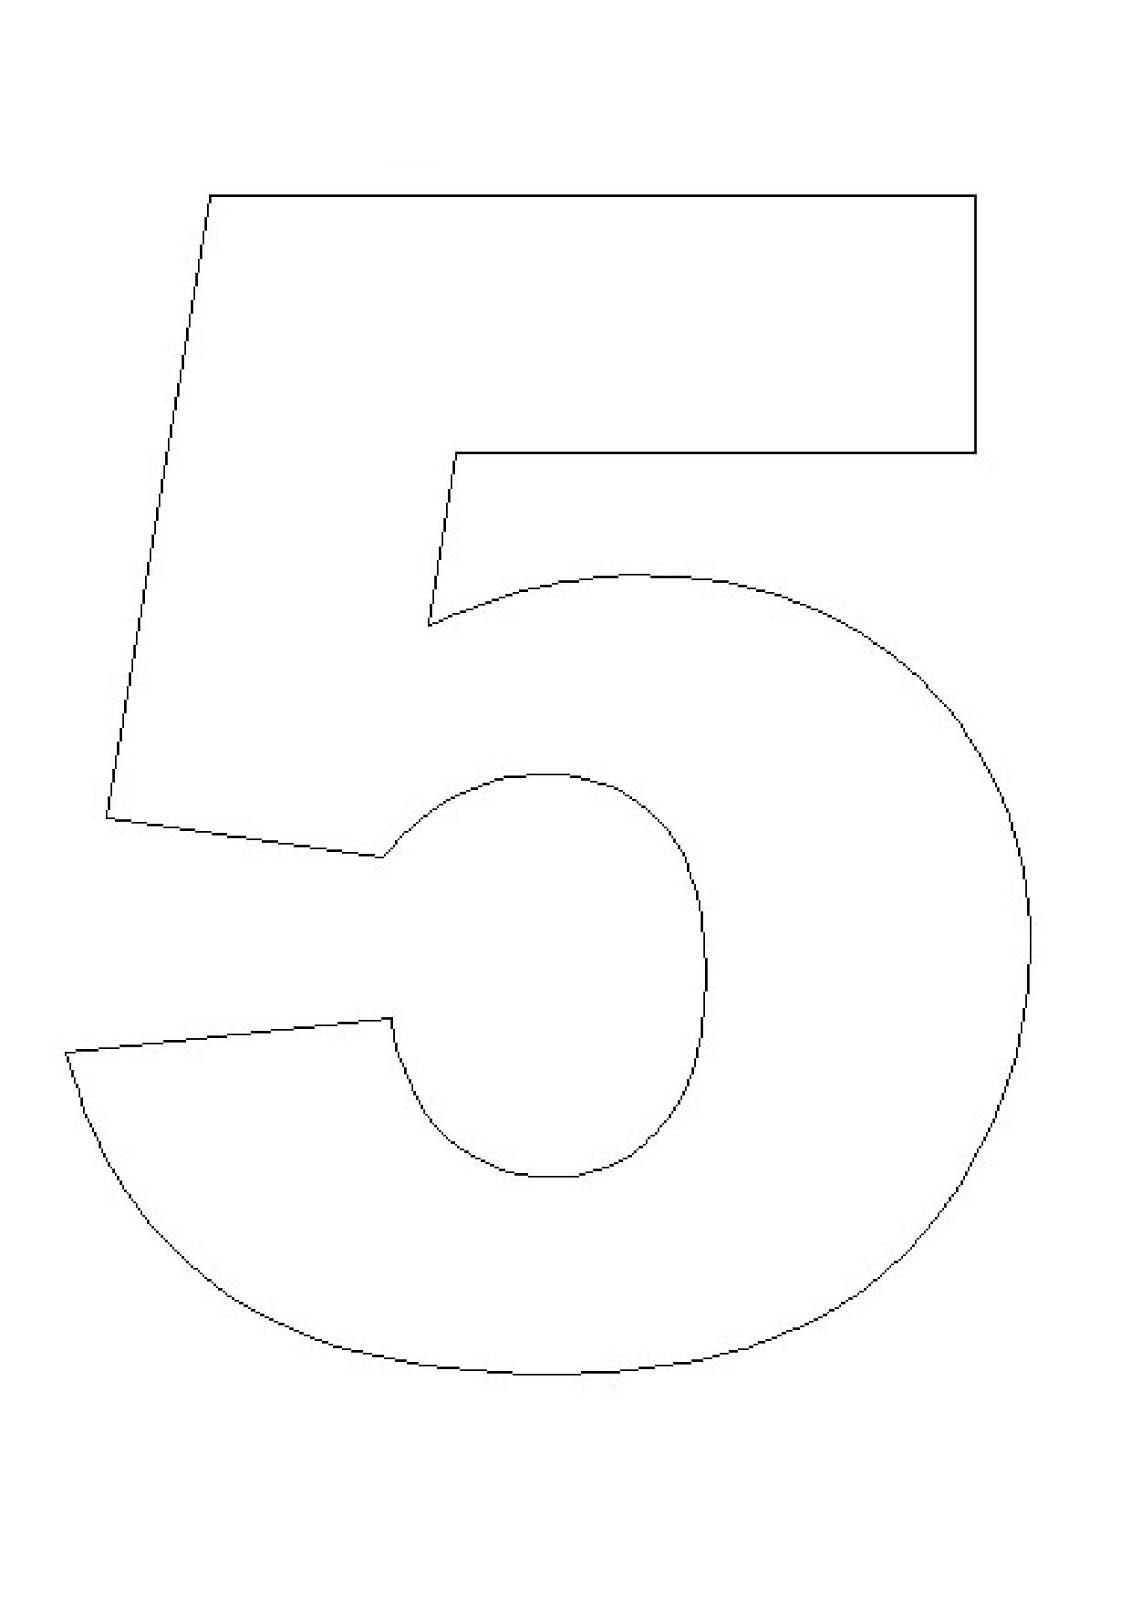 Pinterest Diy Home Decor Crafts Pin Numero 5 Para Colorir Aprender A Escrever Numeros On